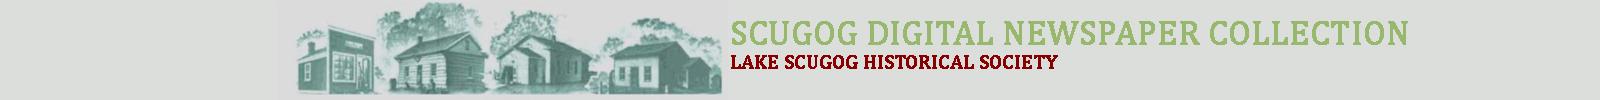 Lake Scugog Historical Society Historic Digital Newspaper Collection